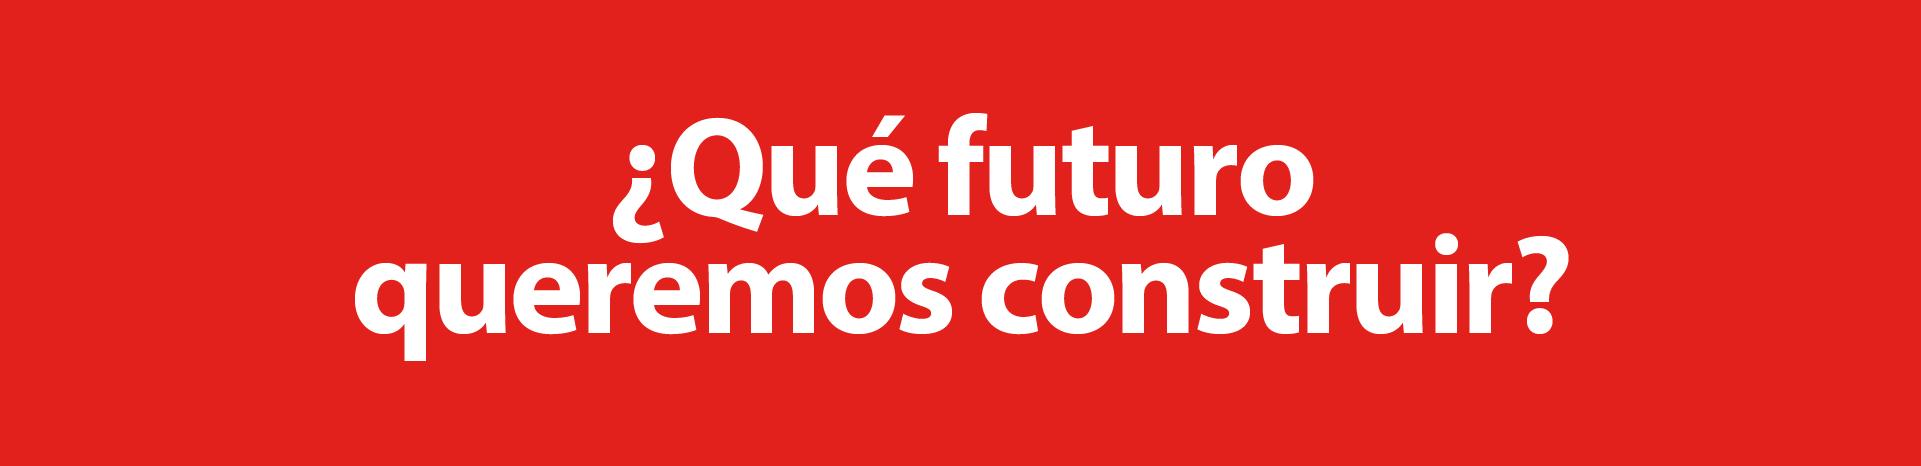 banner bicentenario